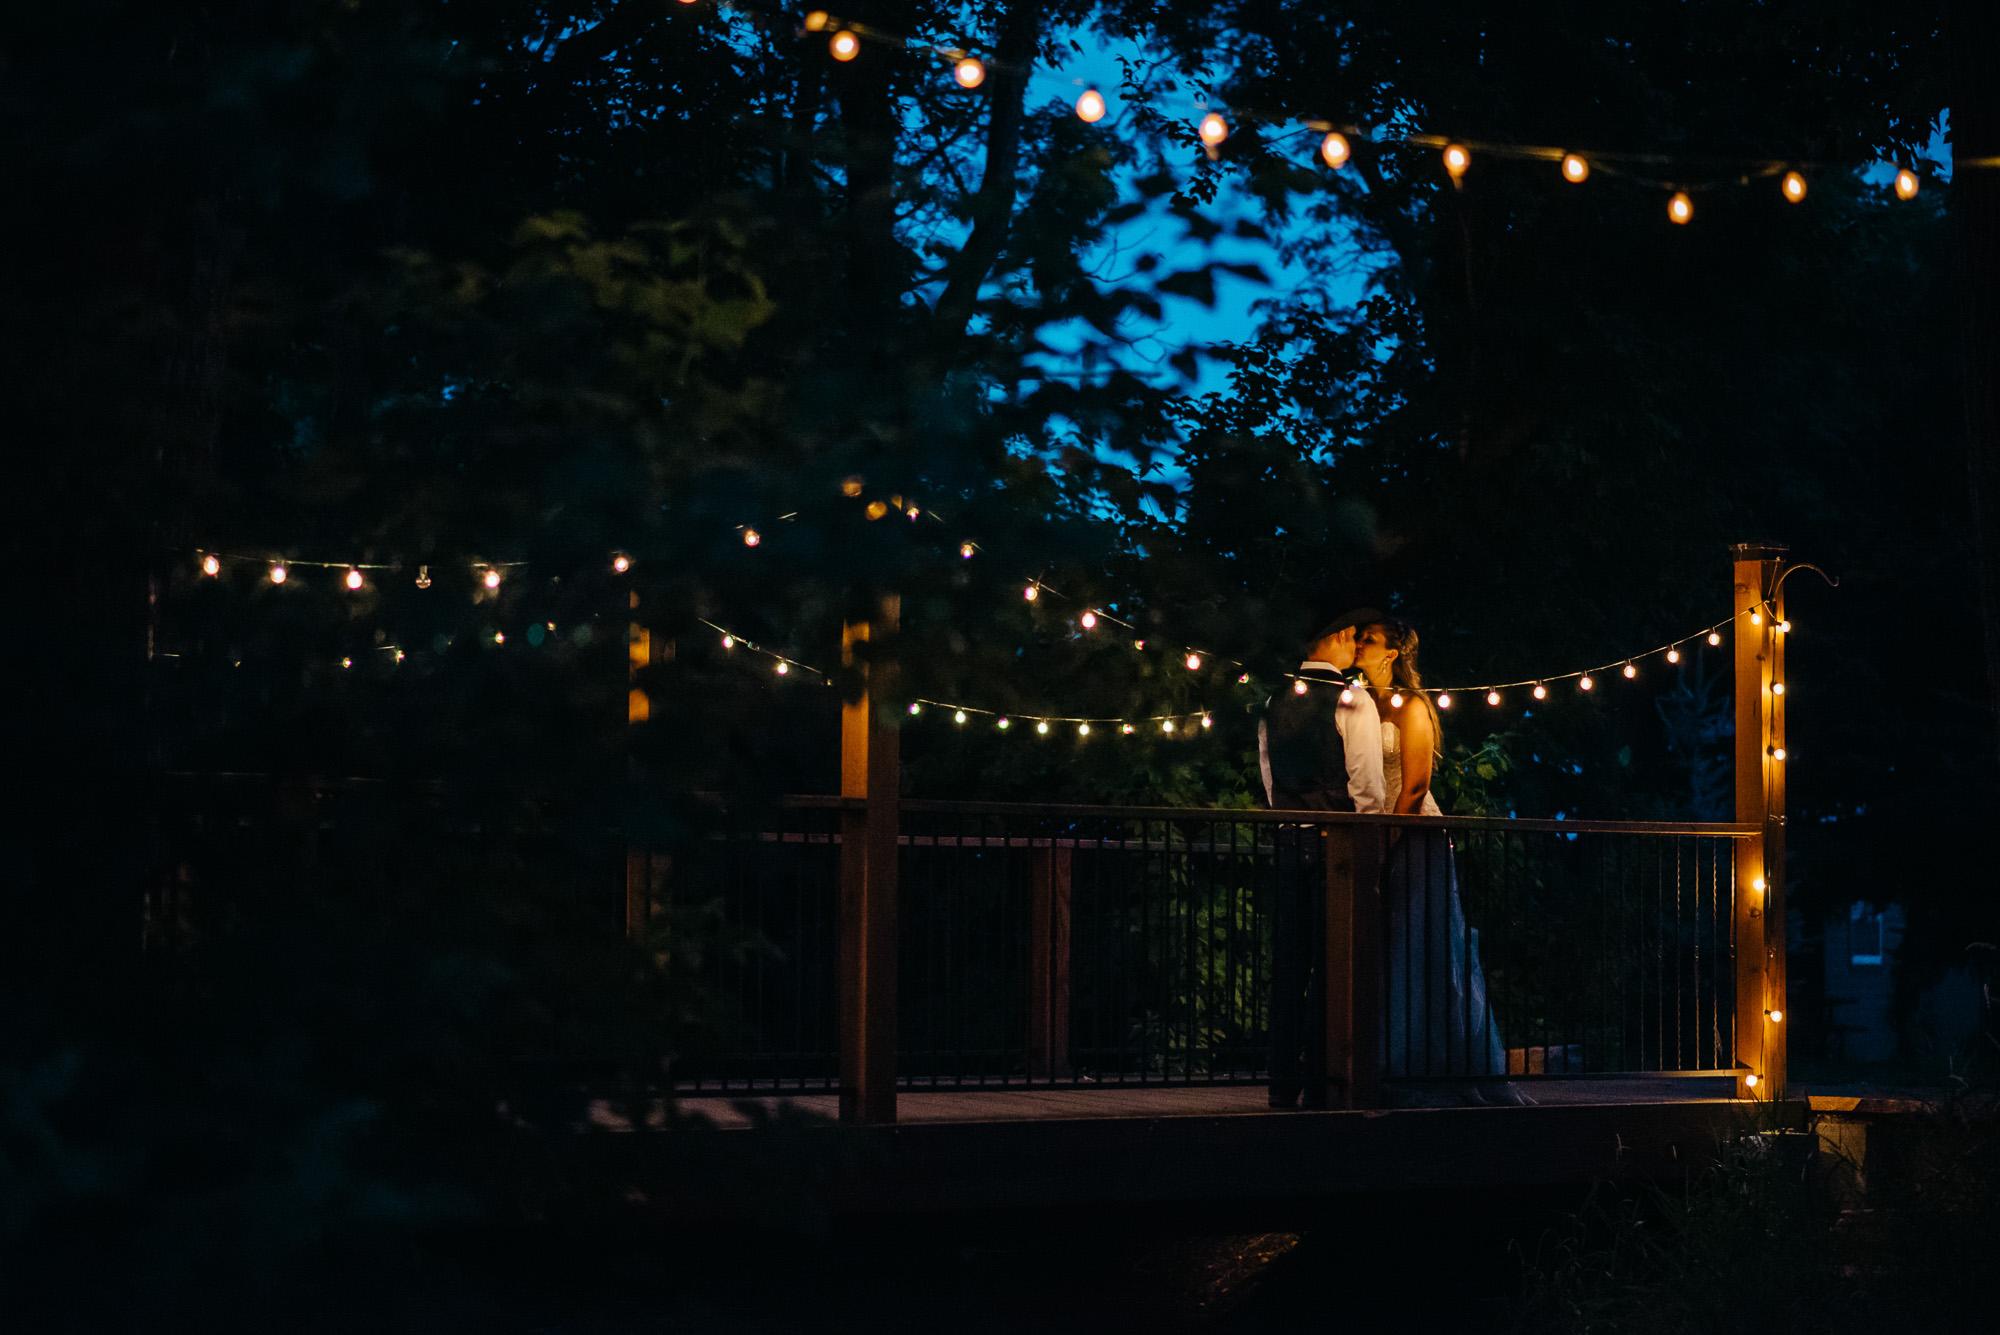 136elopement-photographer-colorado-lyons-farmette-wedding-amy&ben-0330.jpg